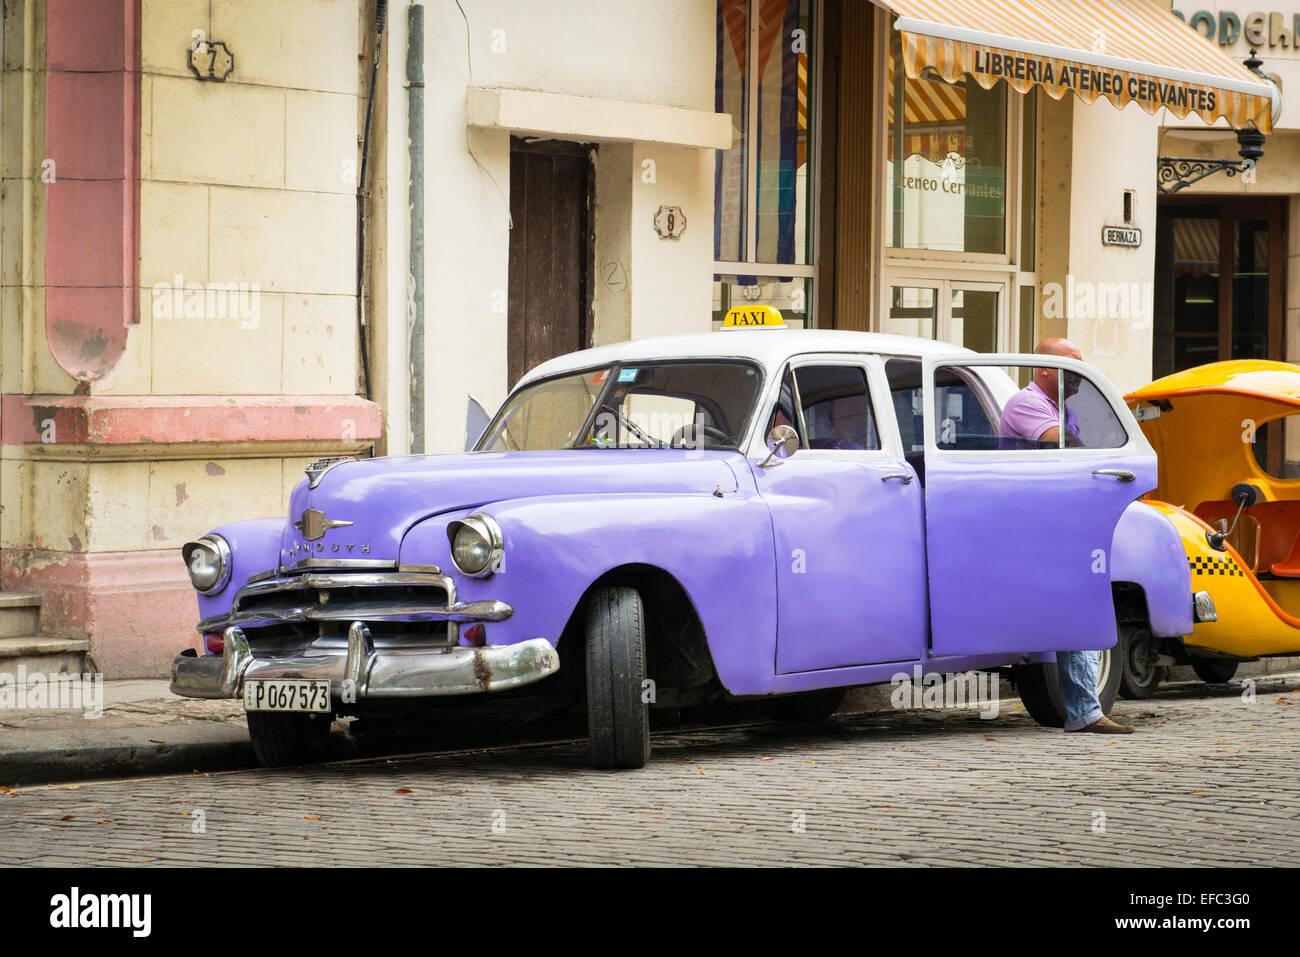 Cuba Old Havana Park Parque Albear mauve purple blue convertible drophead Plymouth classic veteran US American car - Stock Image